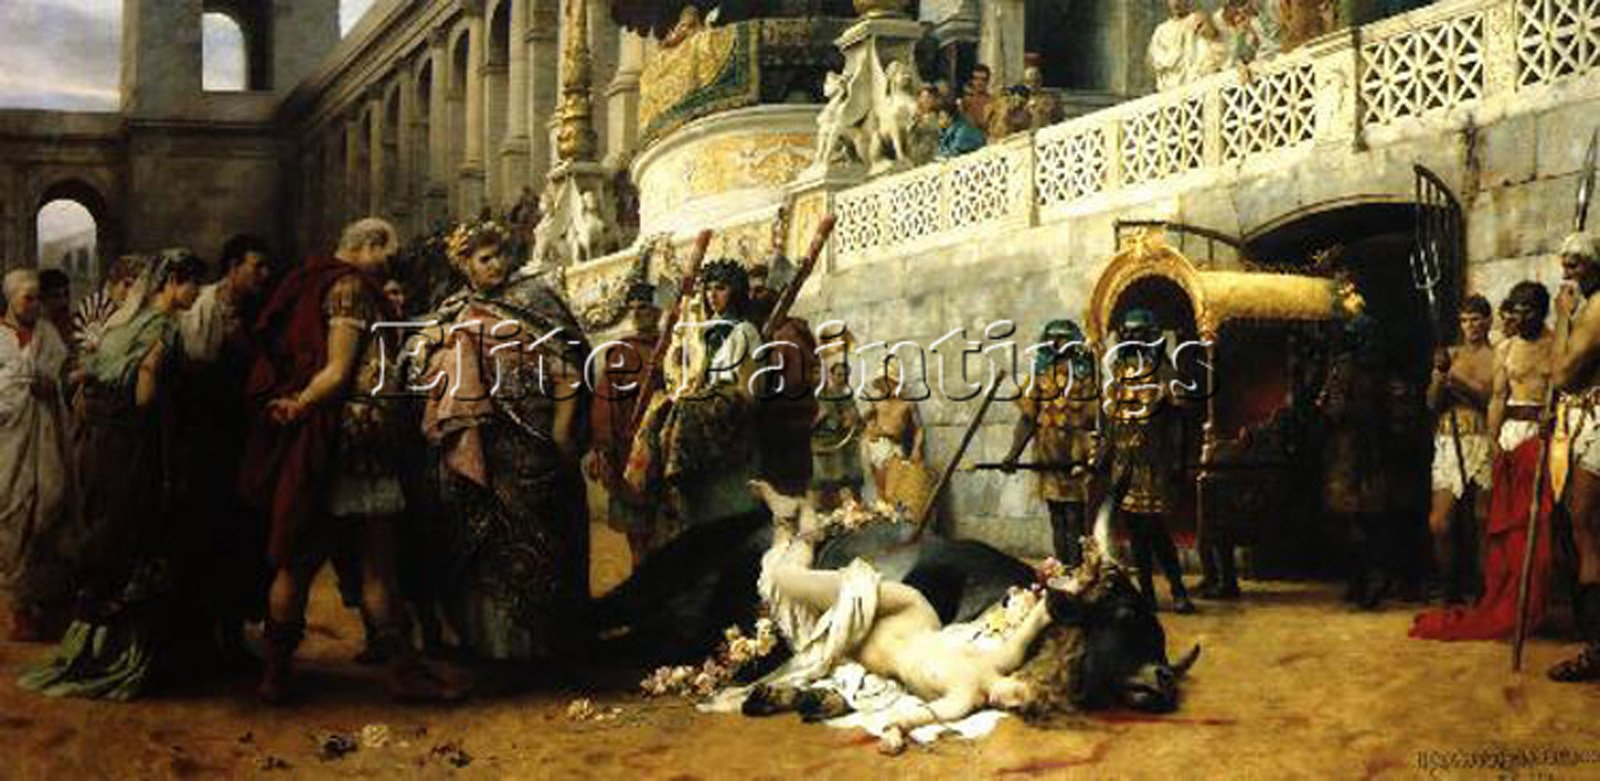 SIEMIRADZKI HENRYK CHRISTIAN DIRCE ARTIST PAINTING OIL CANVAS REPRO ART DECO 16x32inch MUSEUM QUALITY